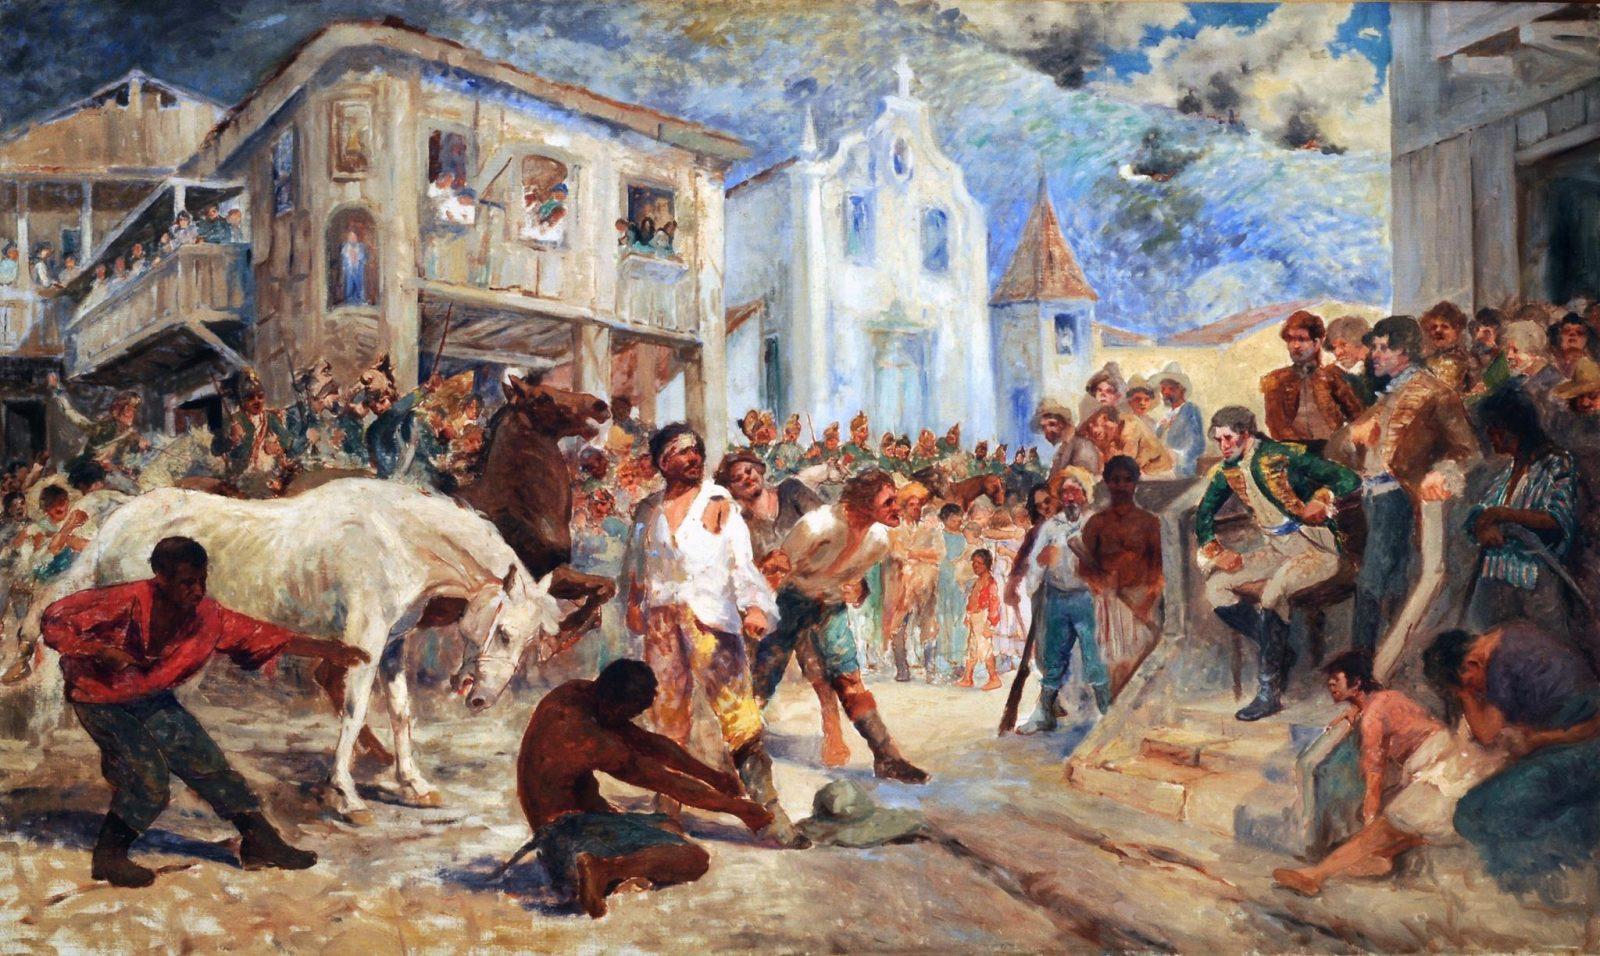 Revolta de Felipe dos Santos